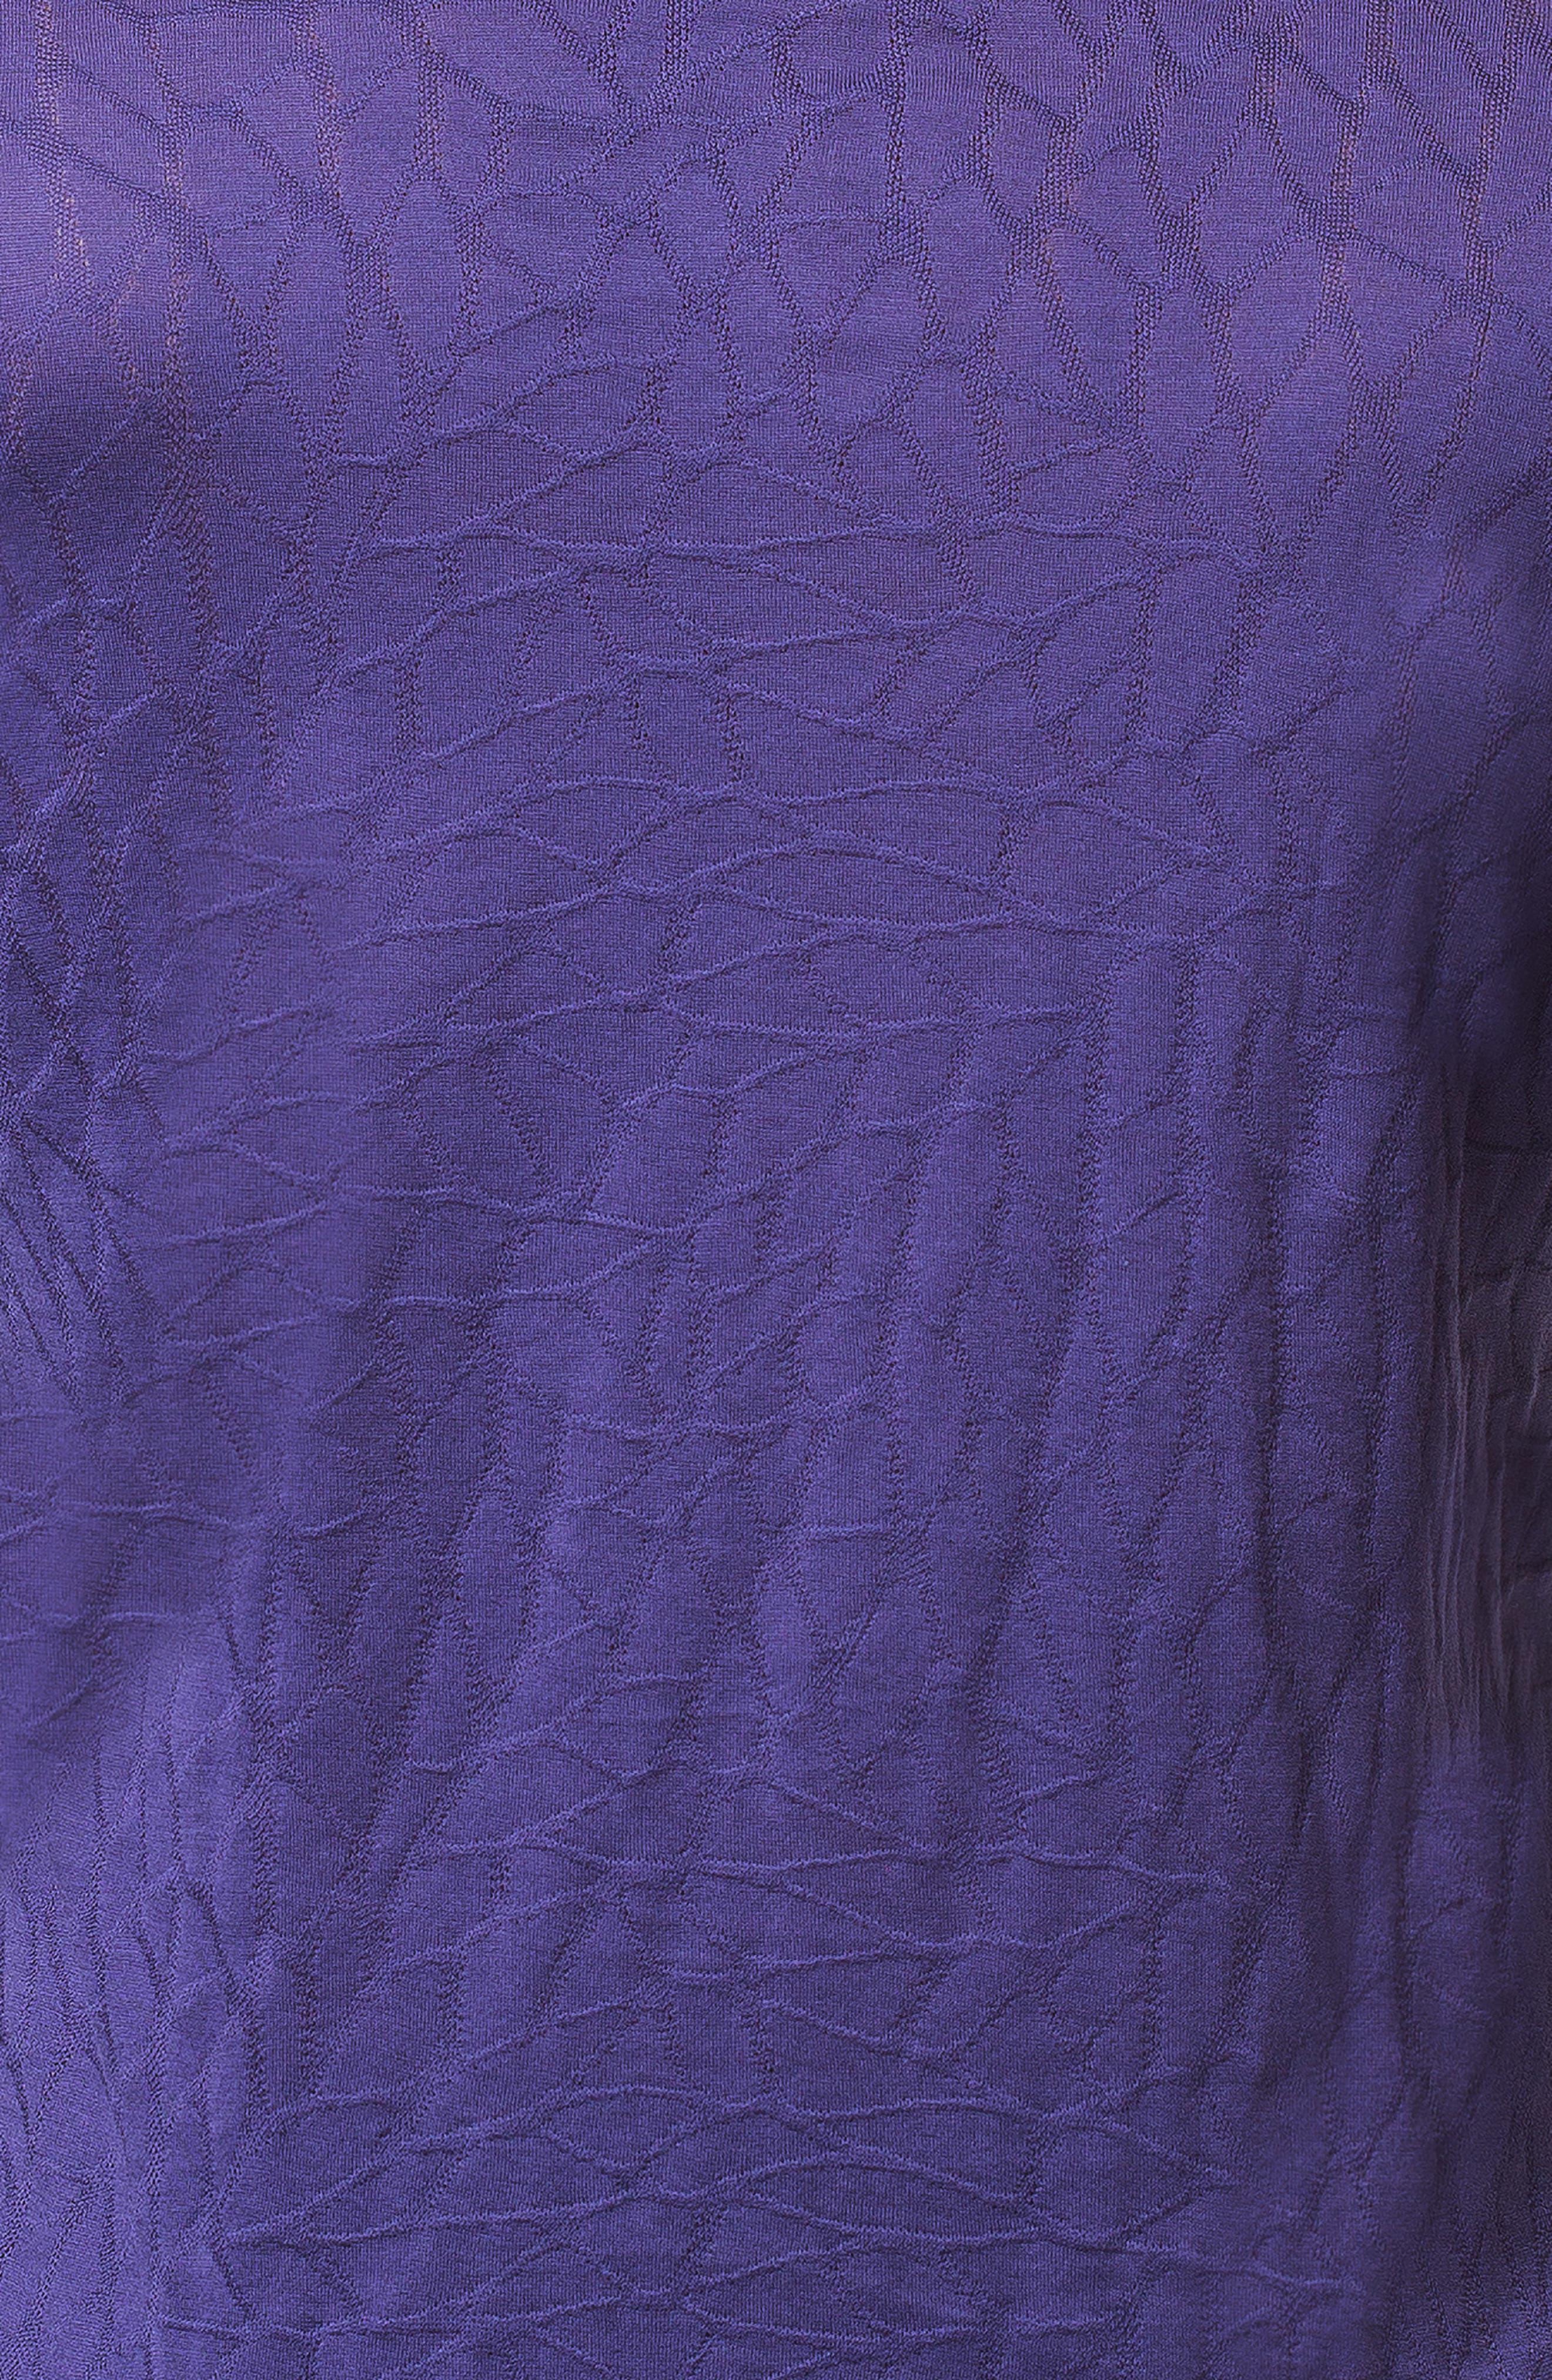 Newton Trim Fit Long Sleeve Polo,                             Alternate thumbnail 3, color,                             PURPLE